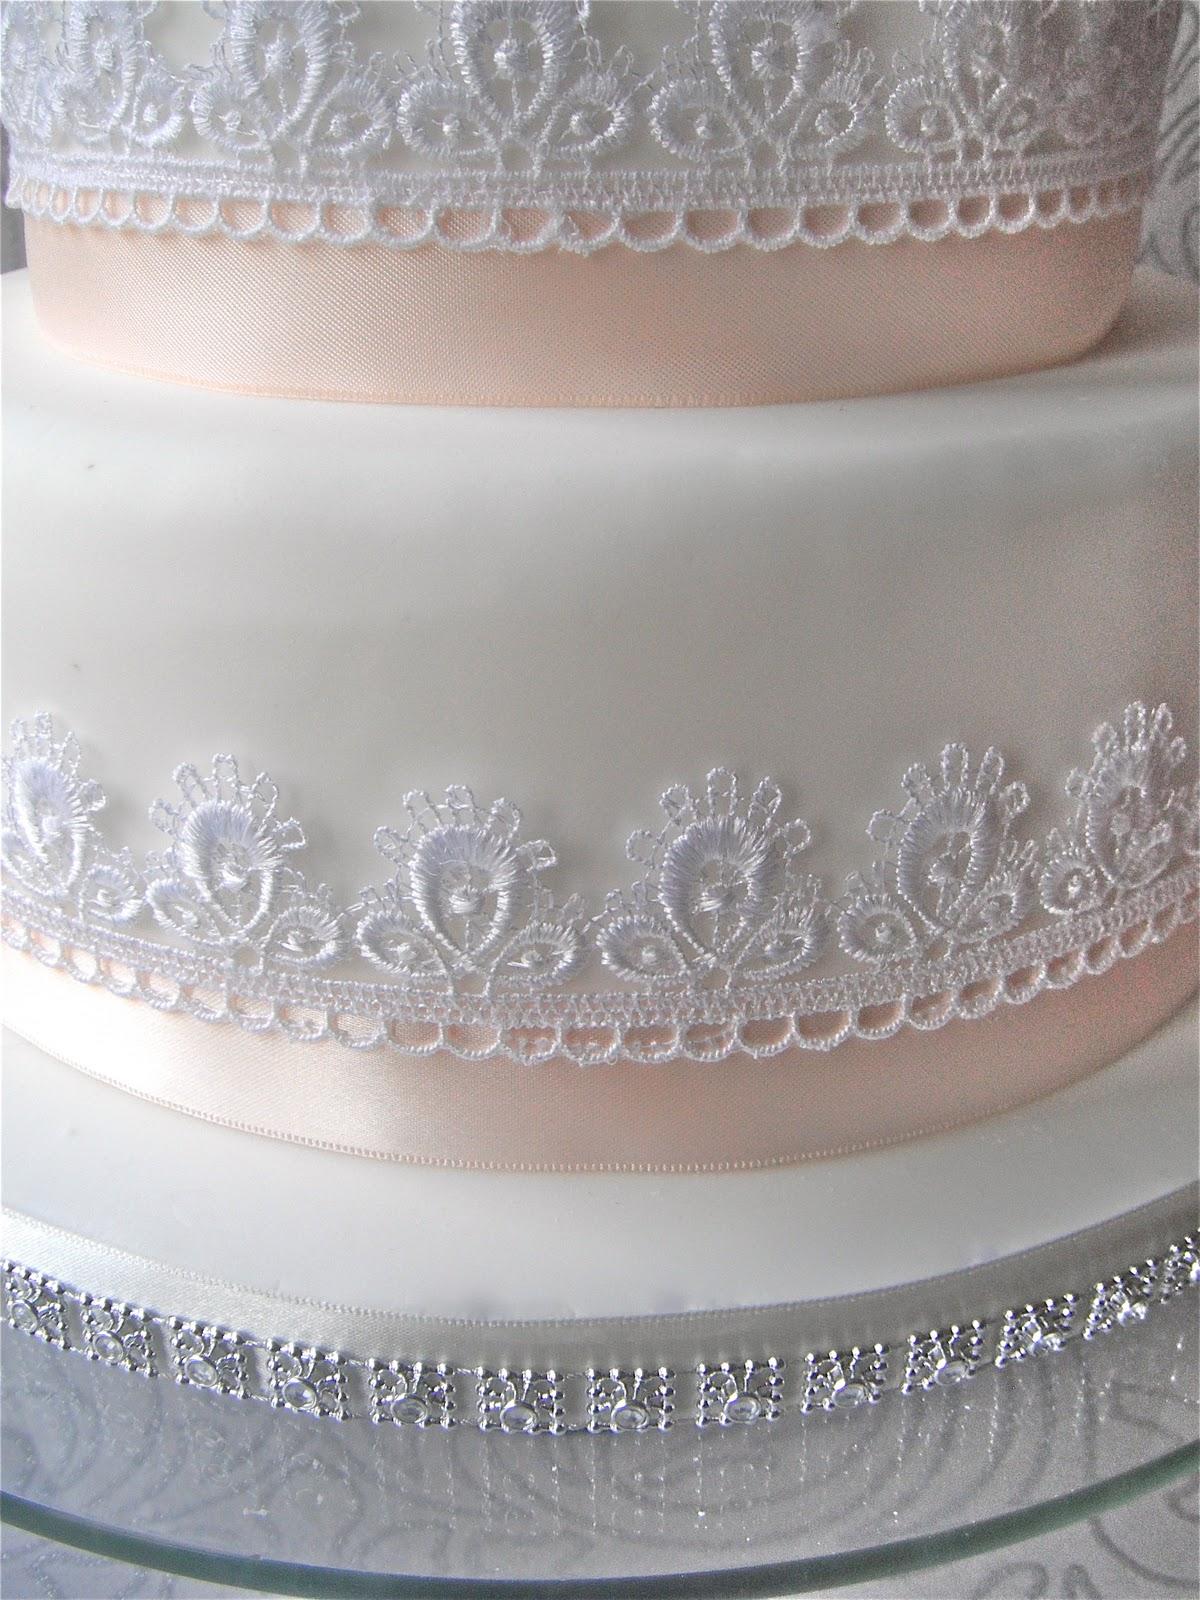 Wedding Cakes meandyoulookbook